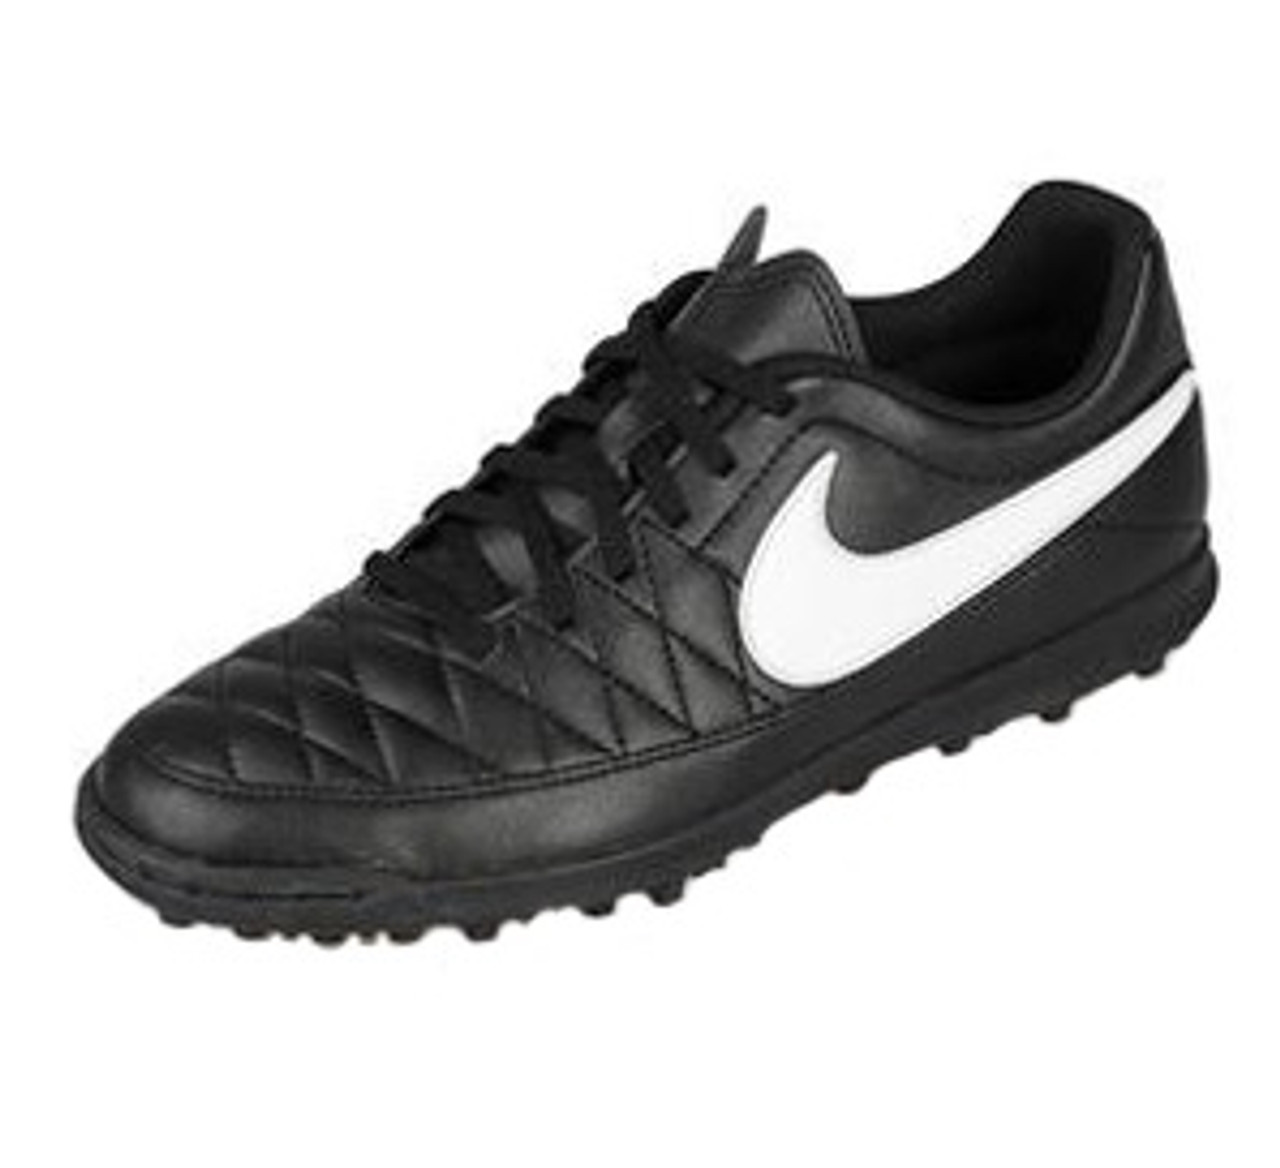 Nike Majestry TF - Black/White/Volt SD